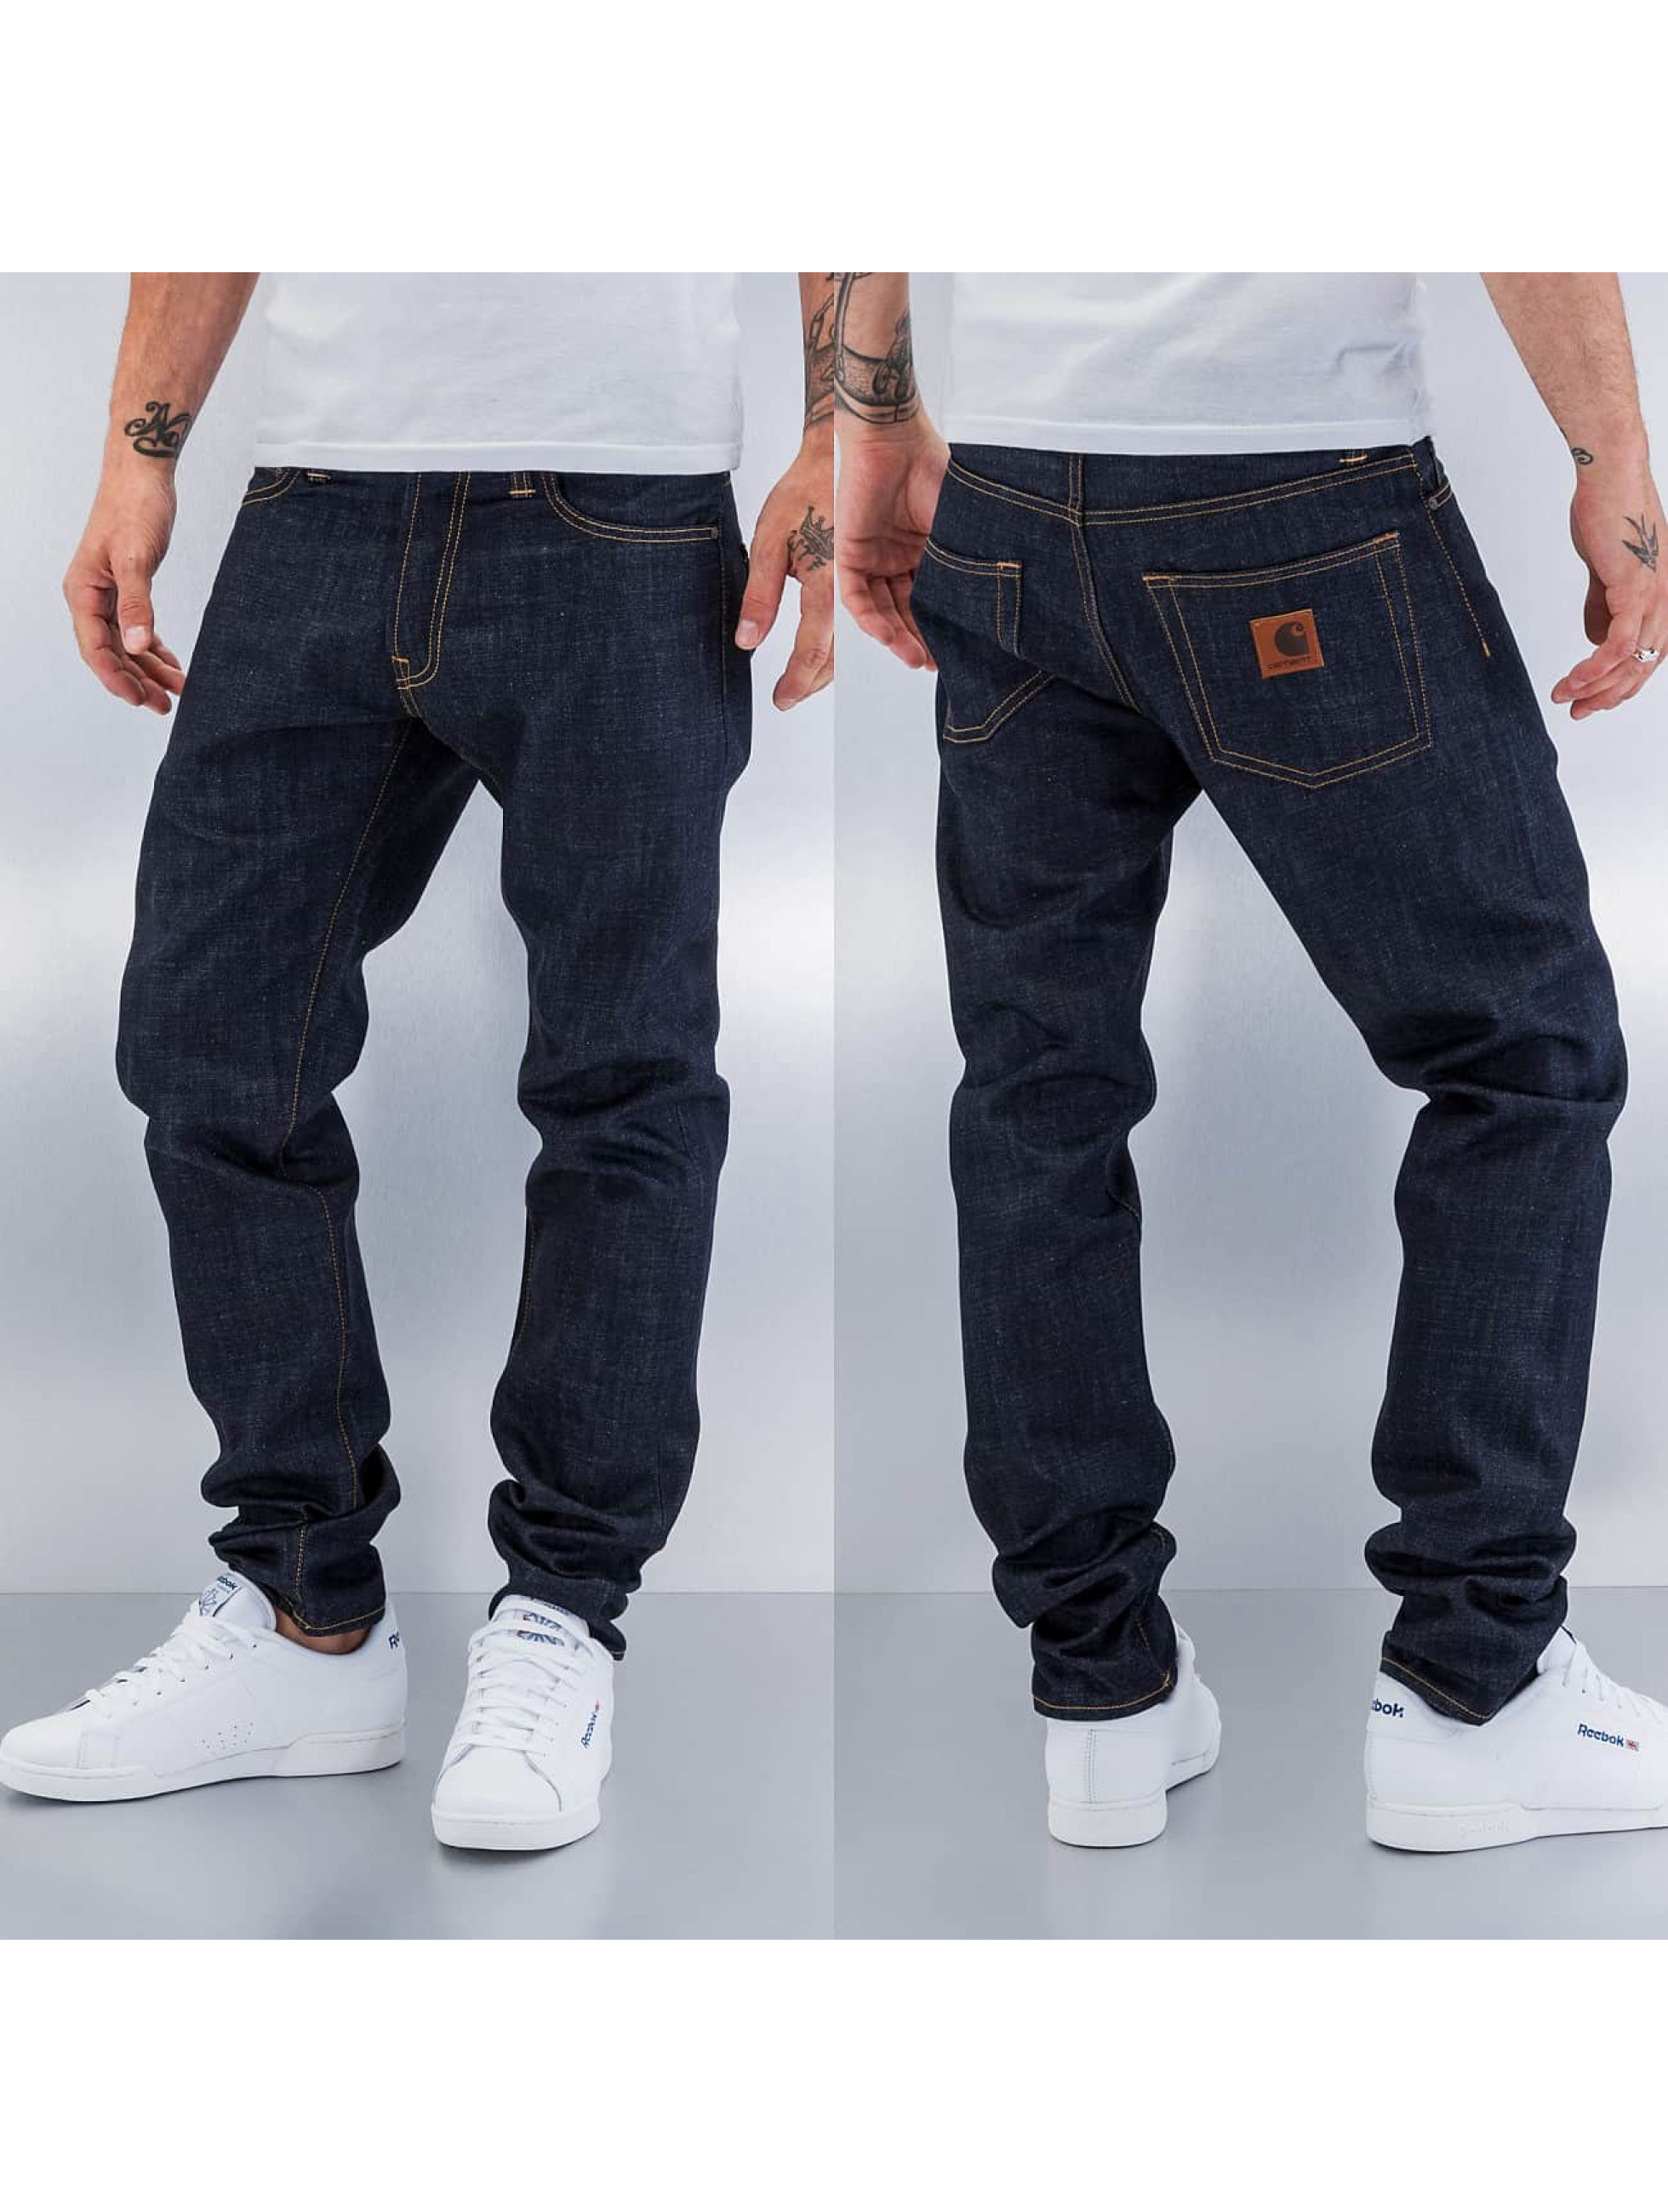 carhartt wip herren straight fit jeans edgewood klondike. Black Bedroom Furniture Sets. Home Design Ideas